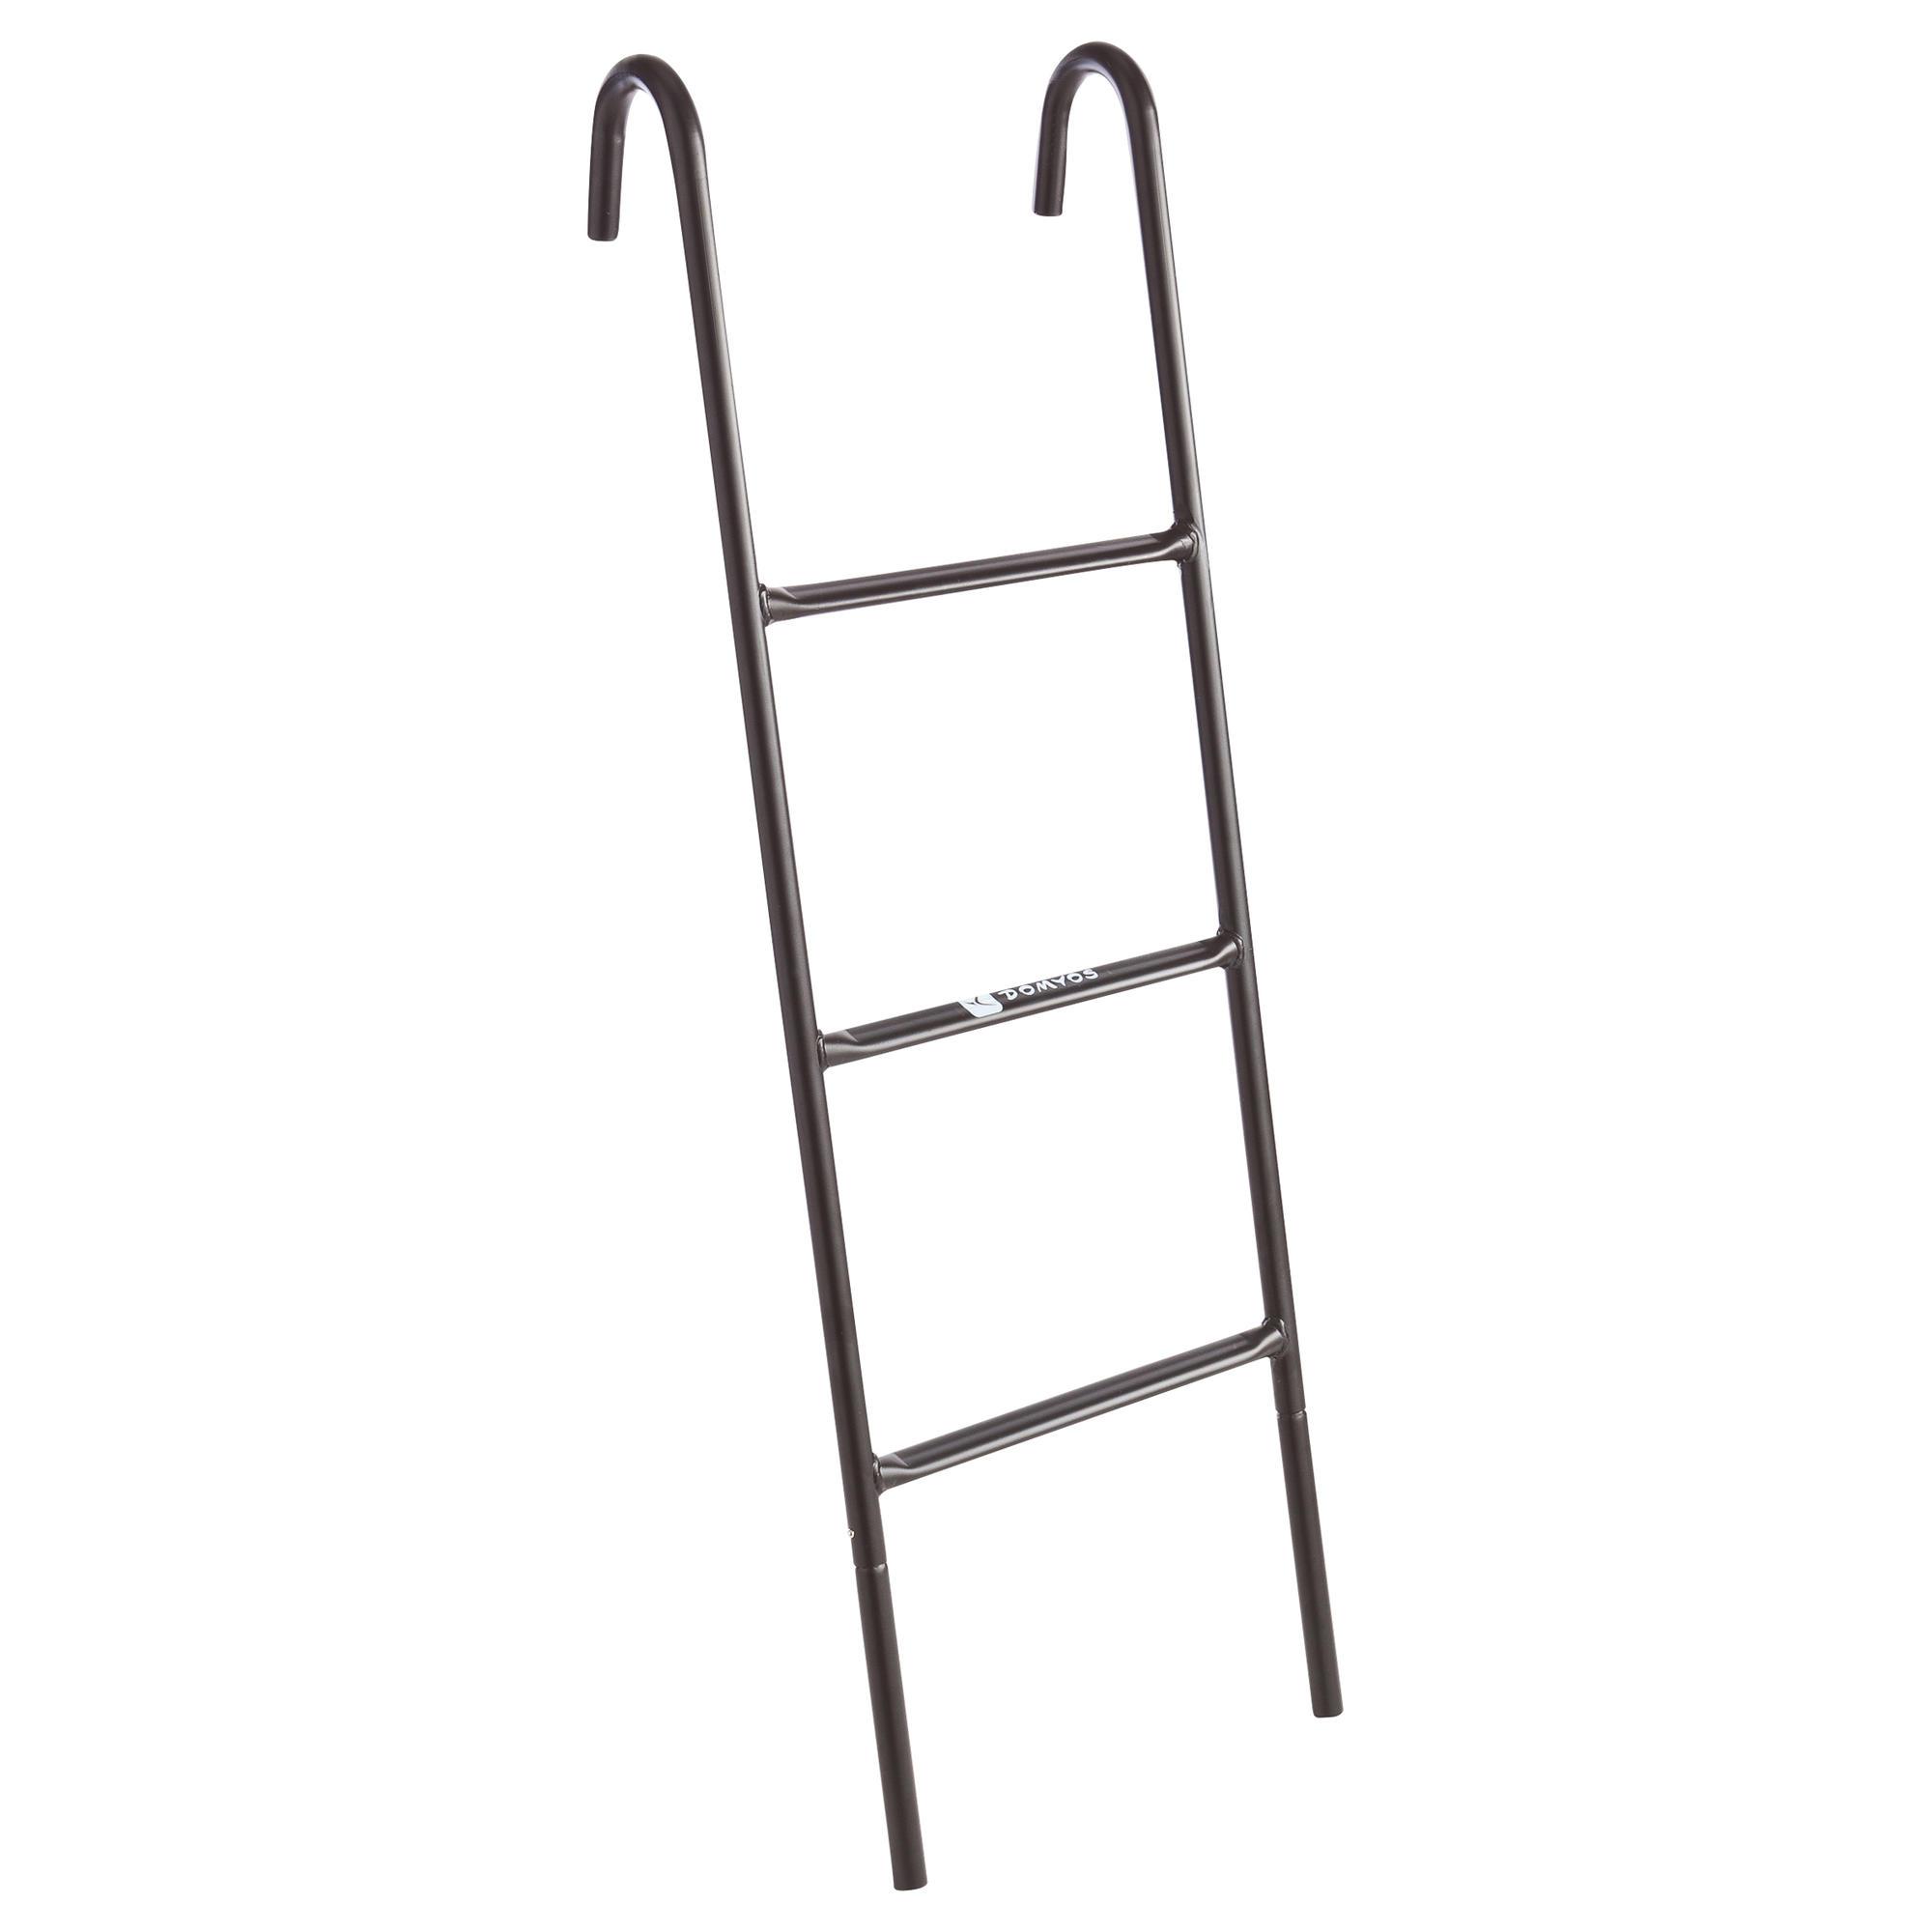 leiter f r trampolin domyos essential 365 und 420cm domyos by decathlon. Black Bedroom Furniture Sets. Home Design Ideas